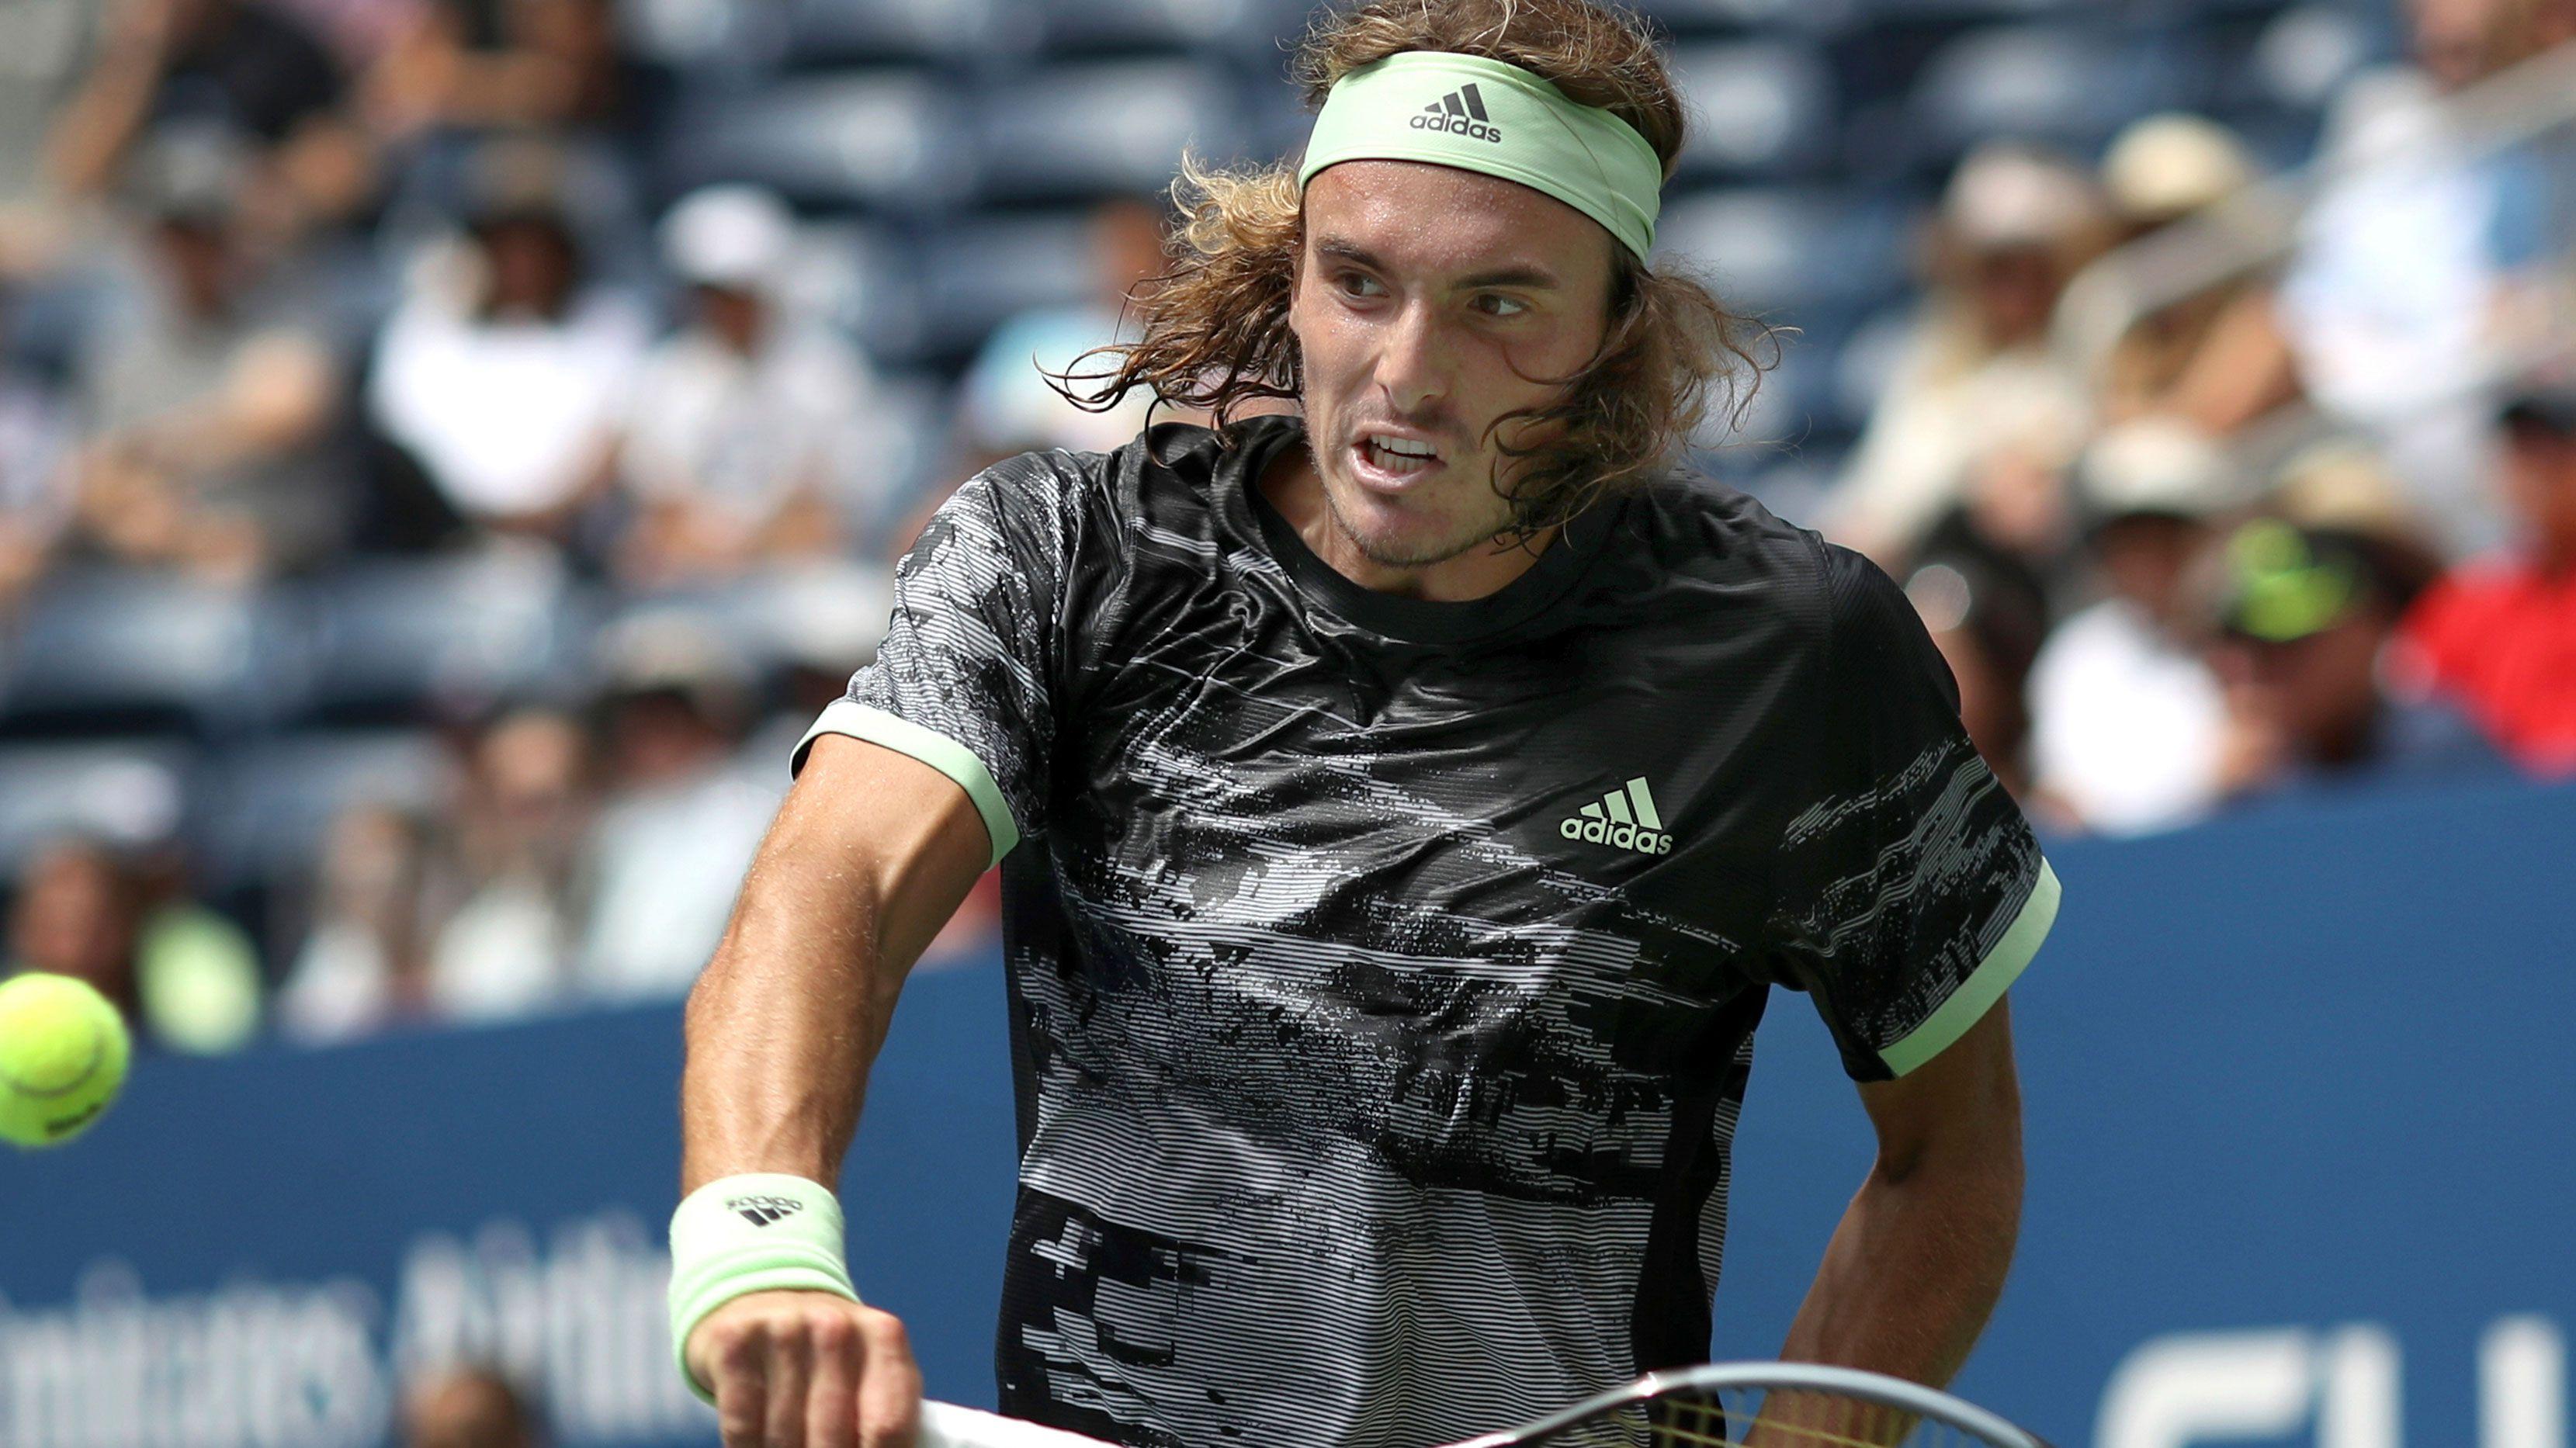 Roger Federer gives his take on Stefanos Tsitsipas' shock lack of 'inspiration'